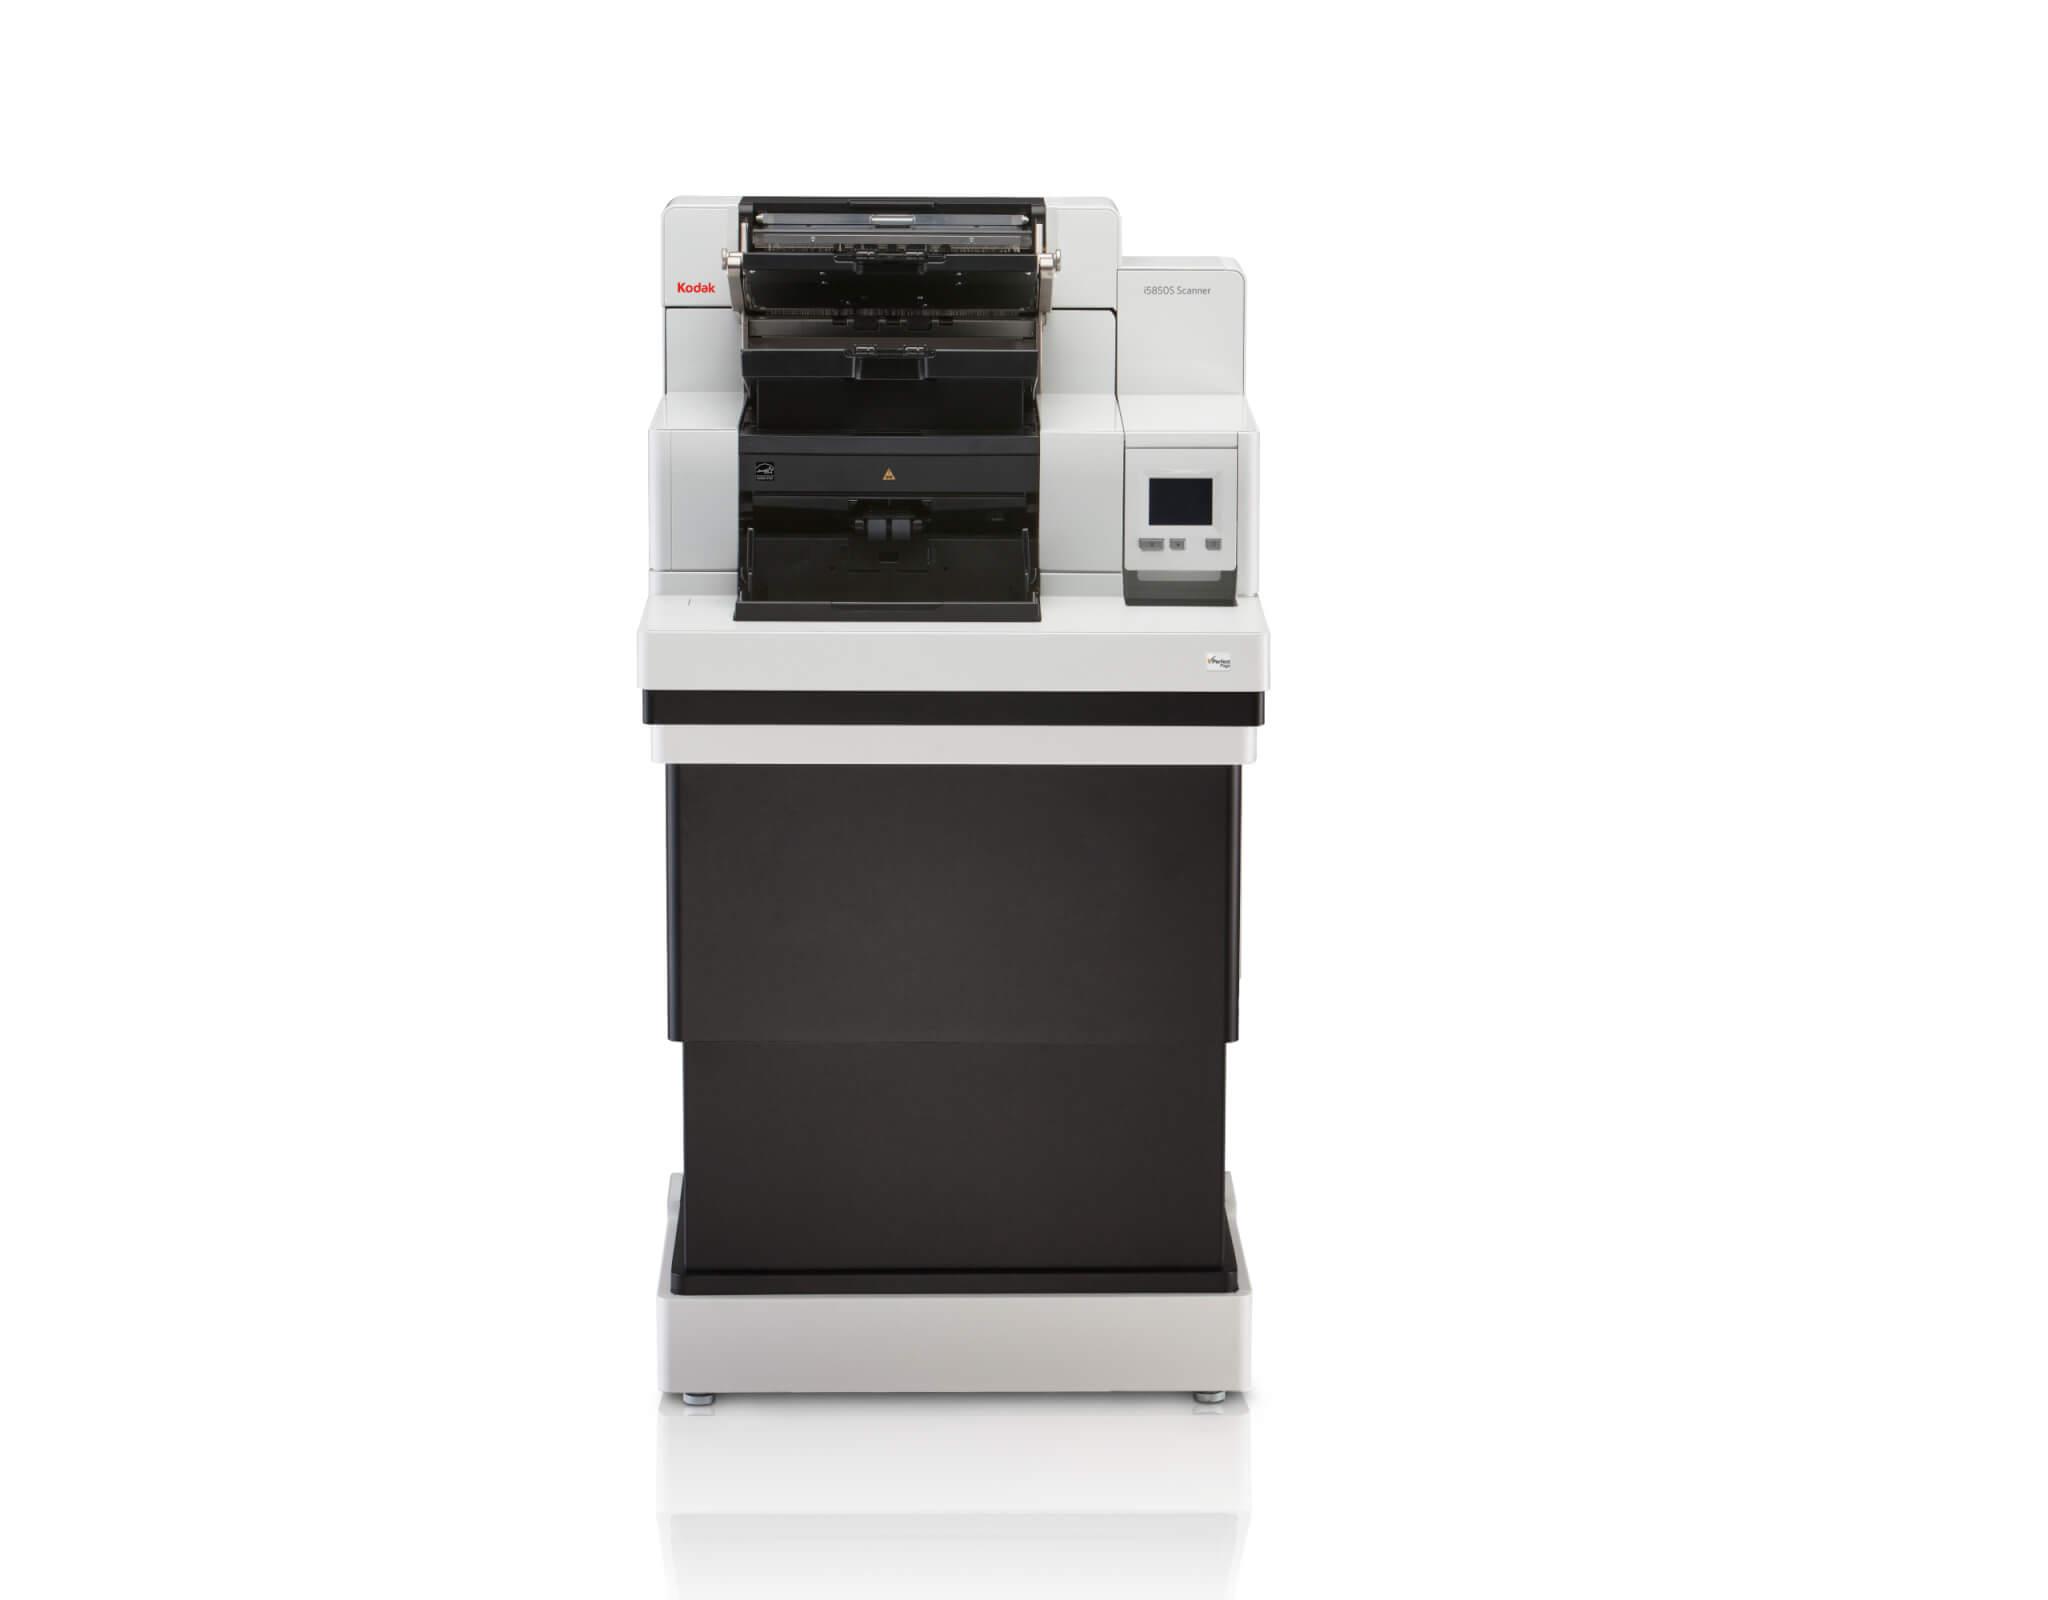 Kodak Production Scanner, Model i5850S with Sorting Capabilities